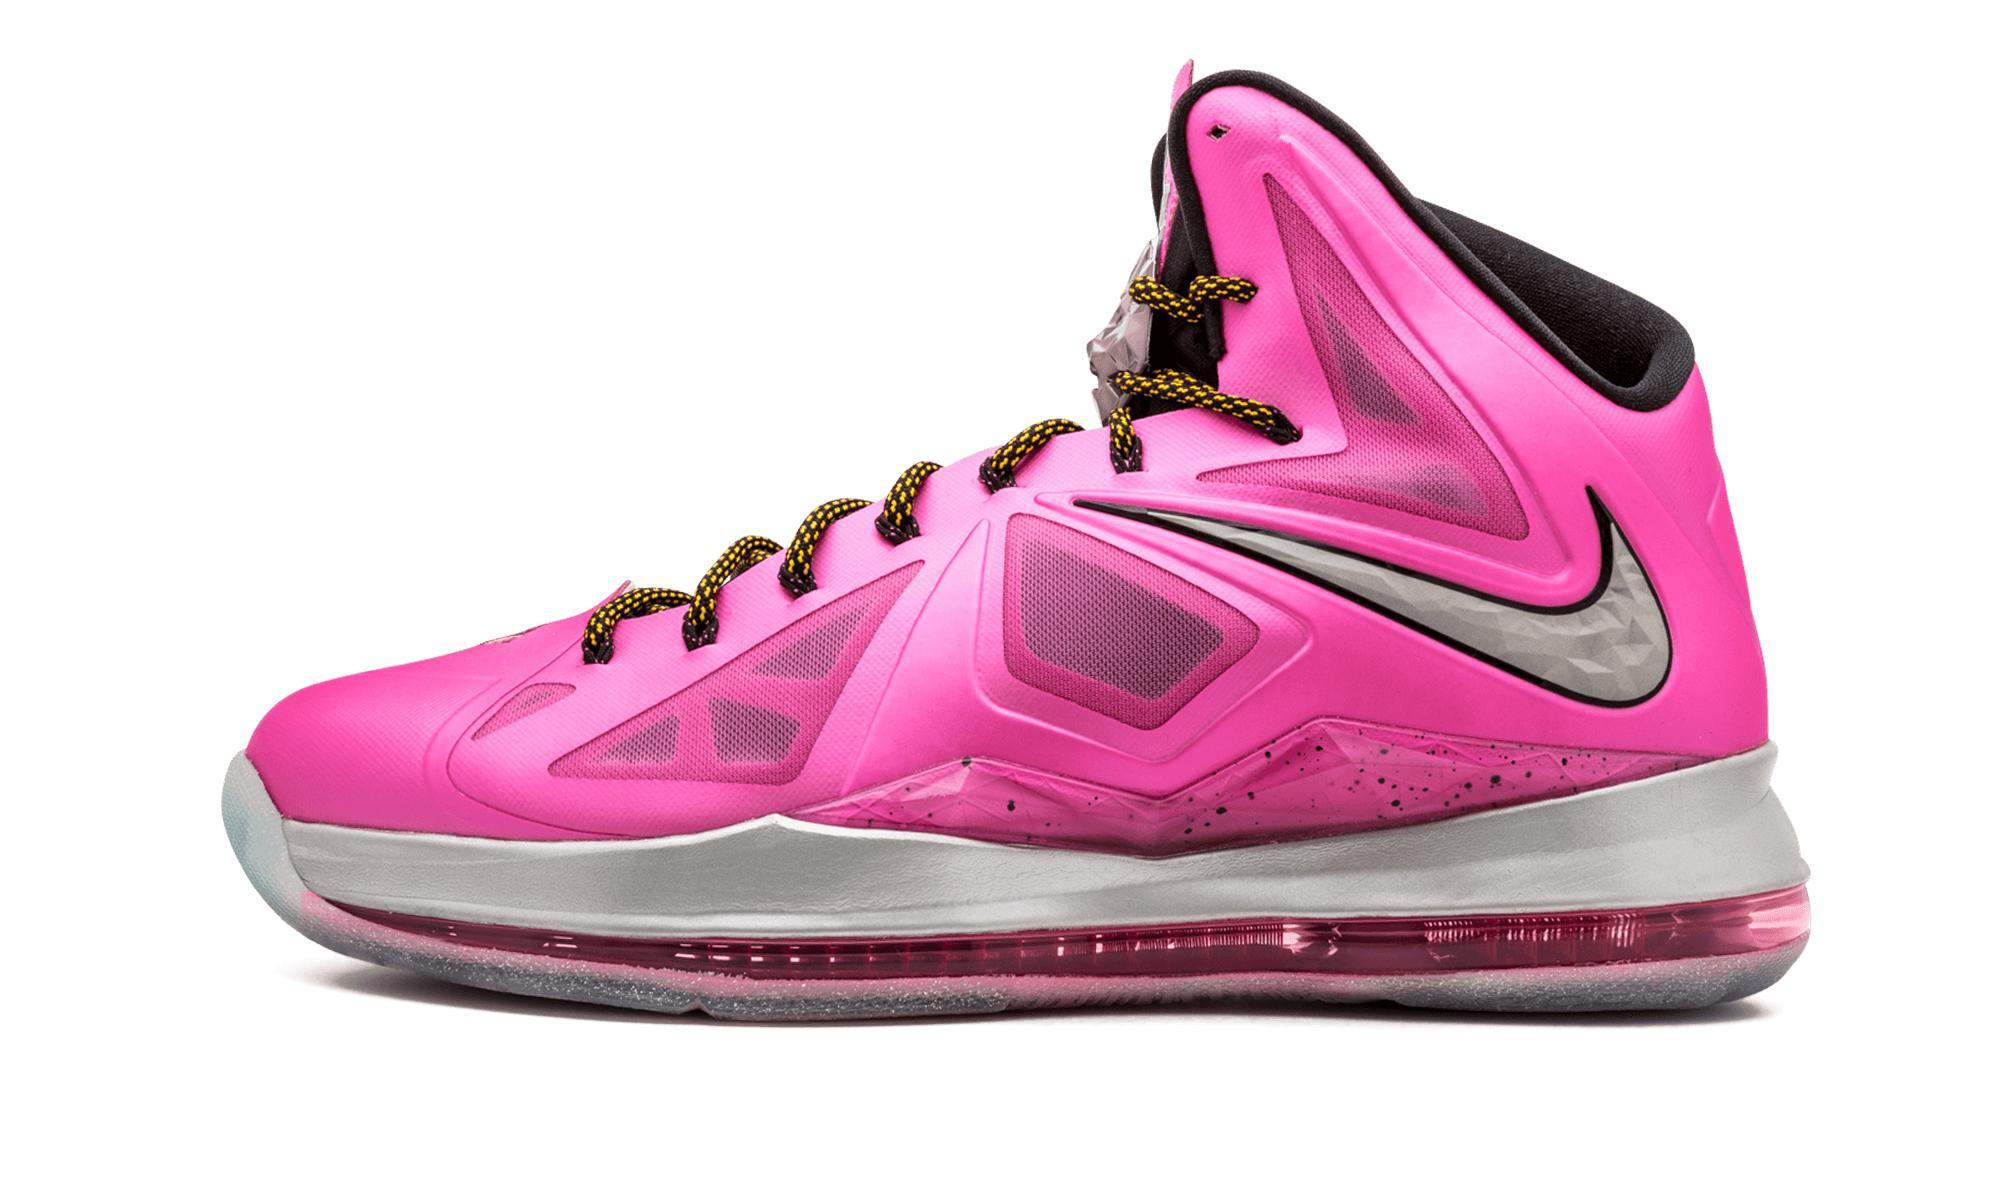 955e40ccf8de Lyst - Nike Lebron 10  kay Yow  Pe in Pink